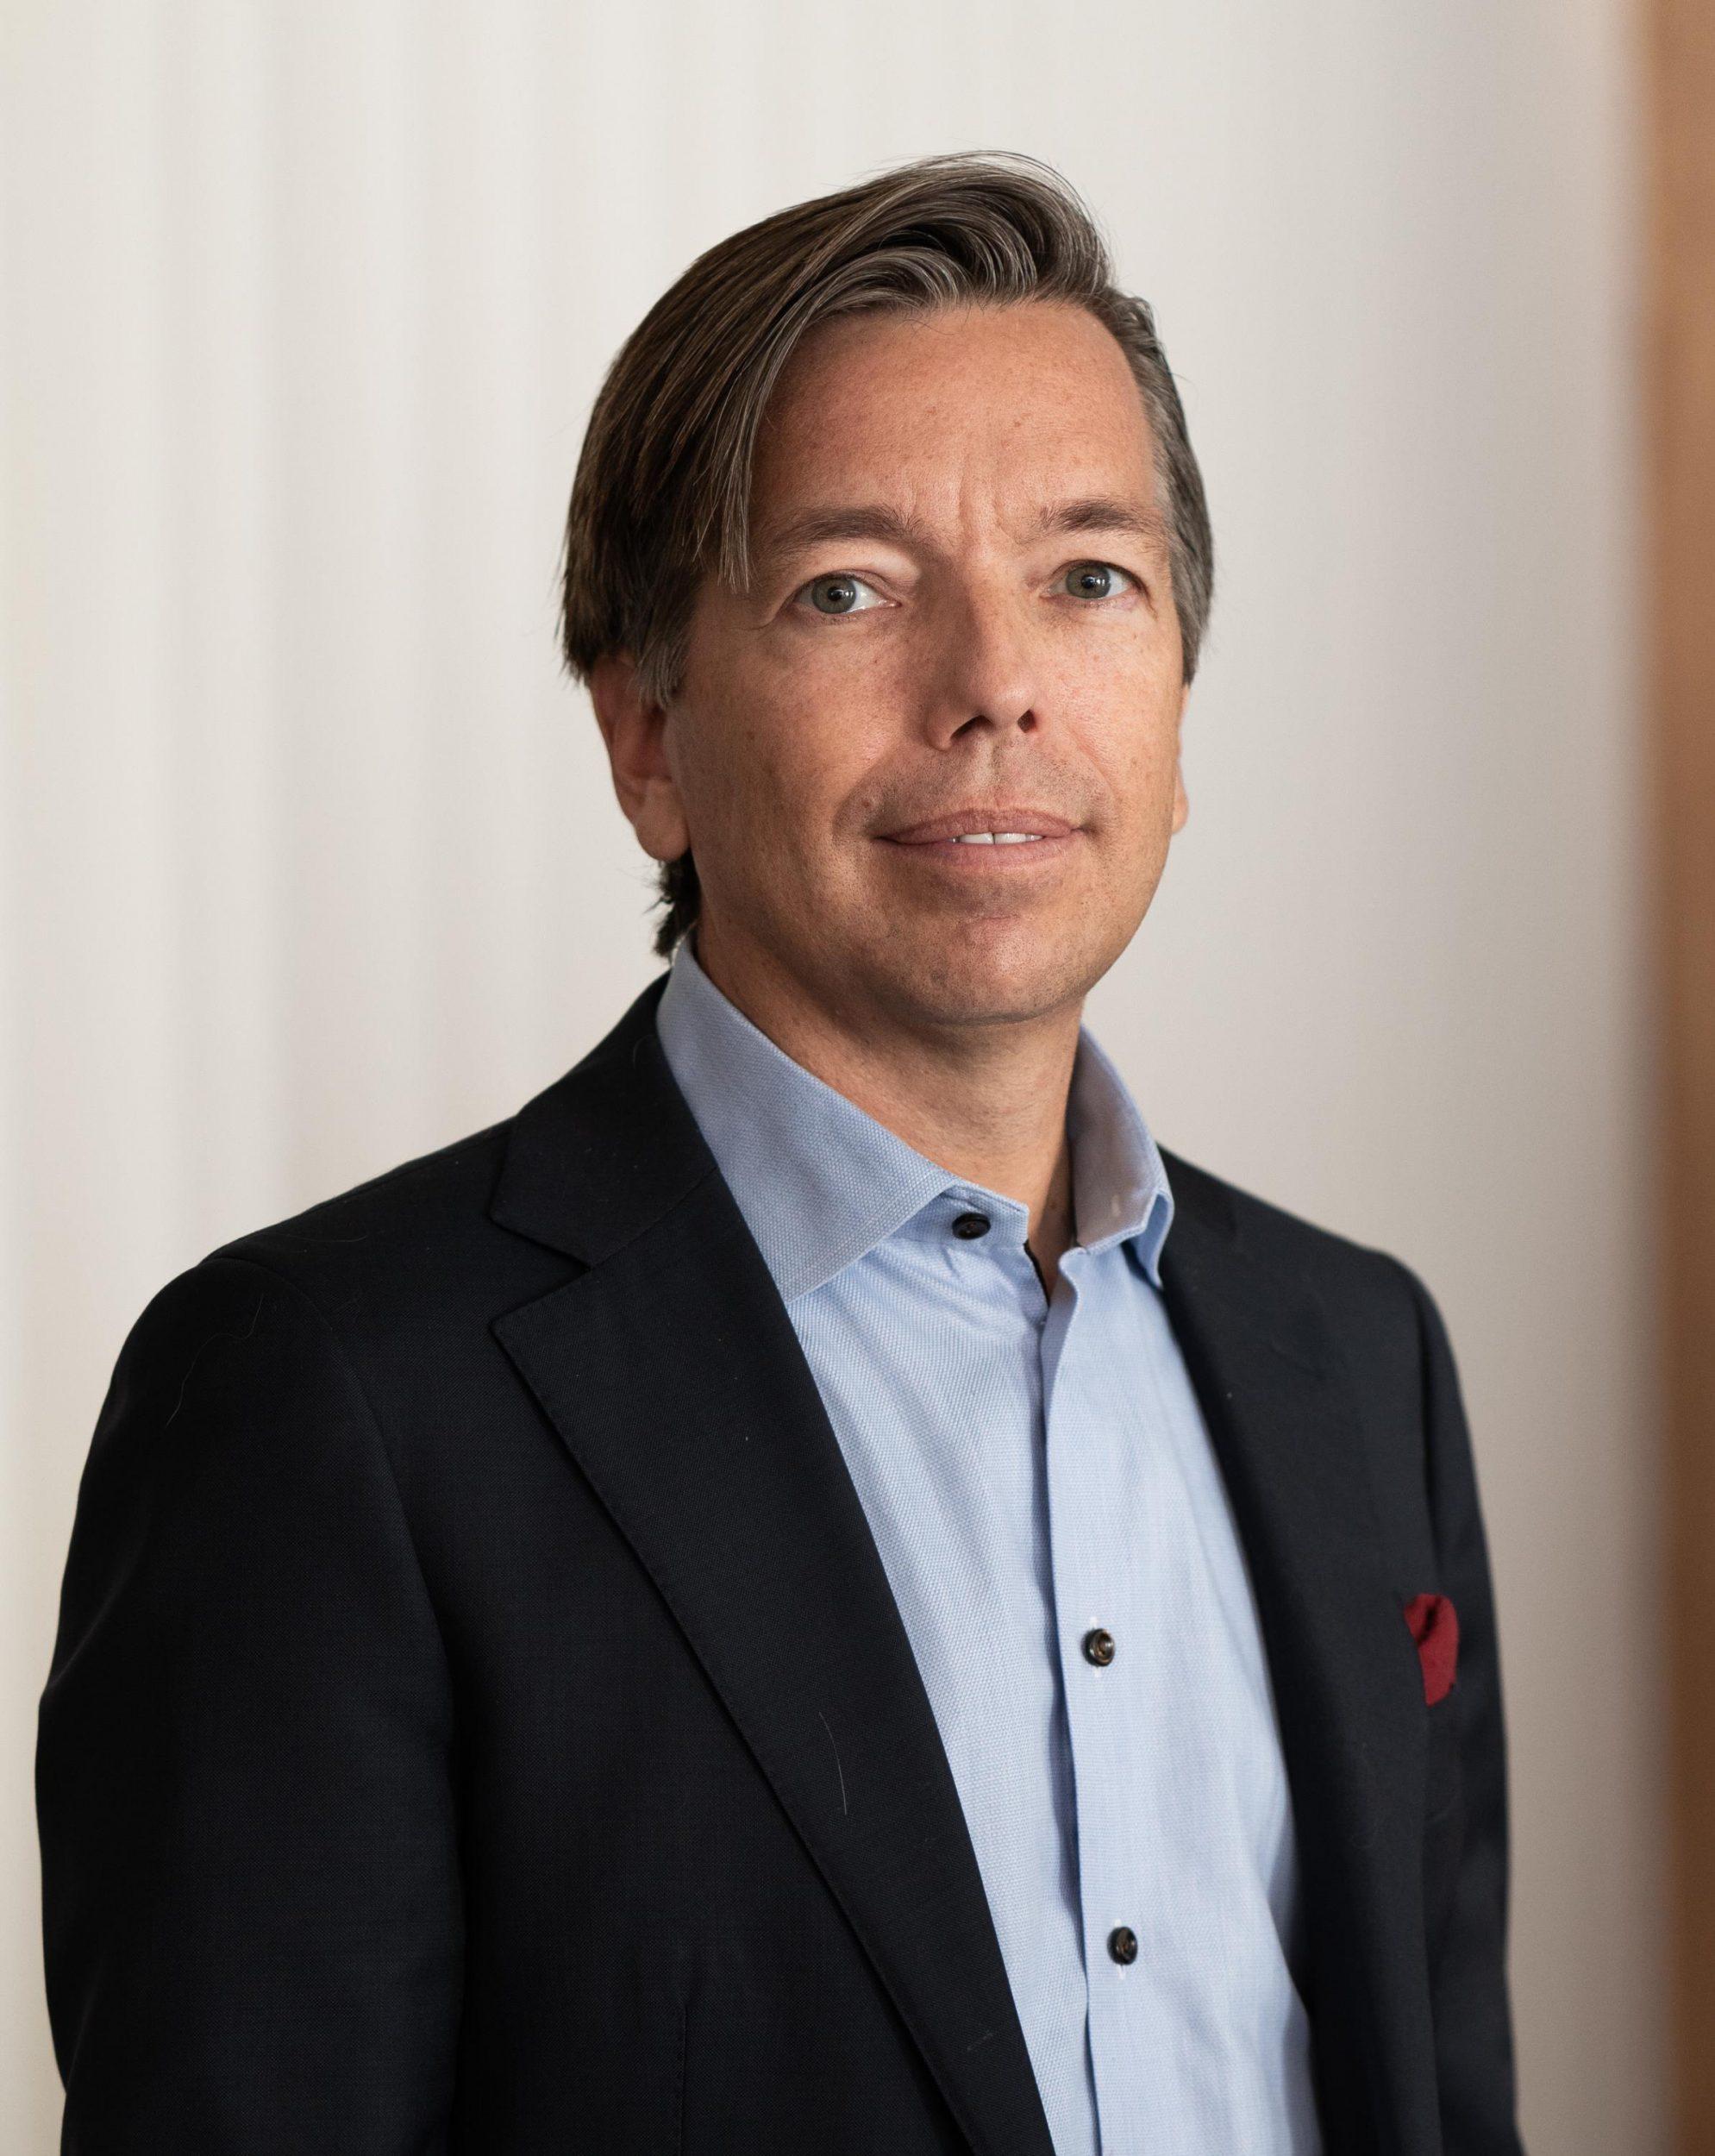 Henric Diefke